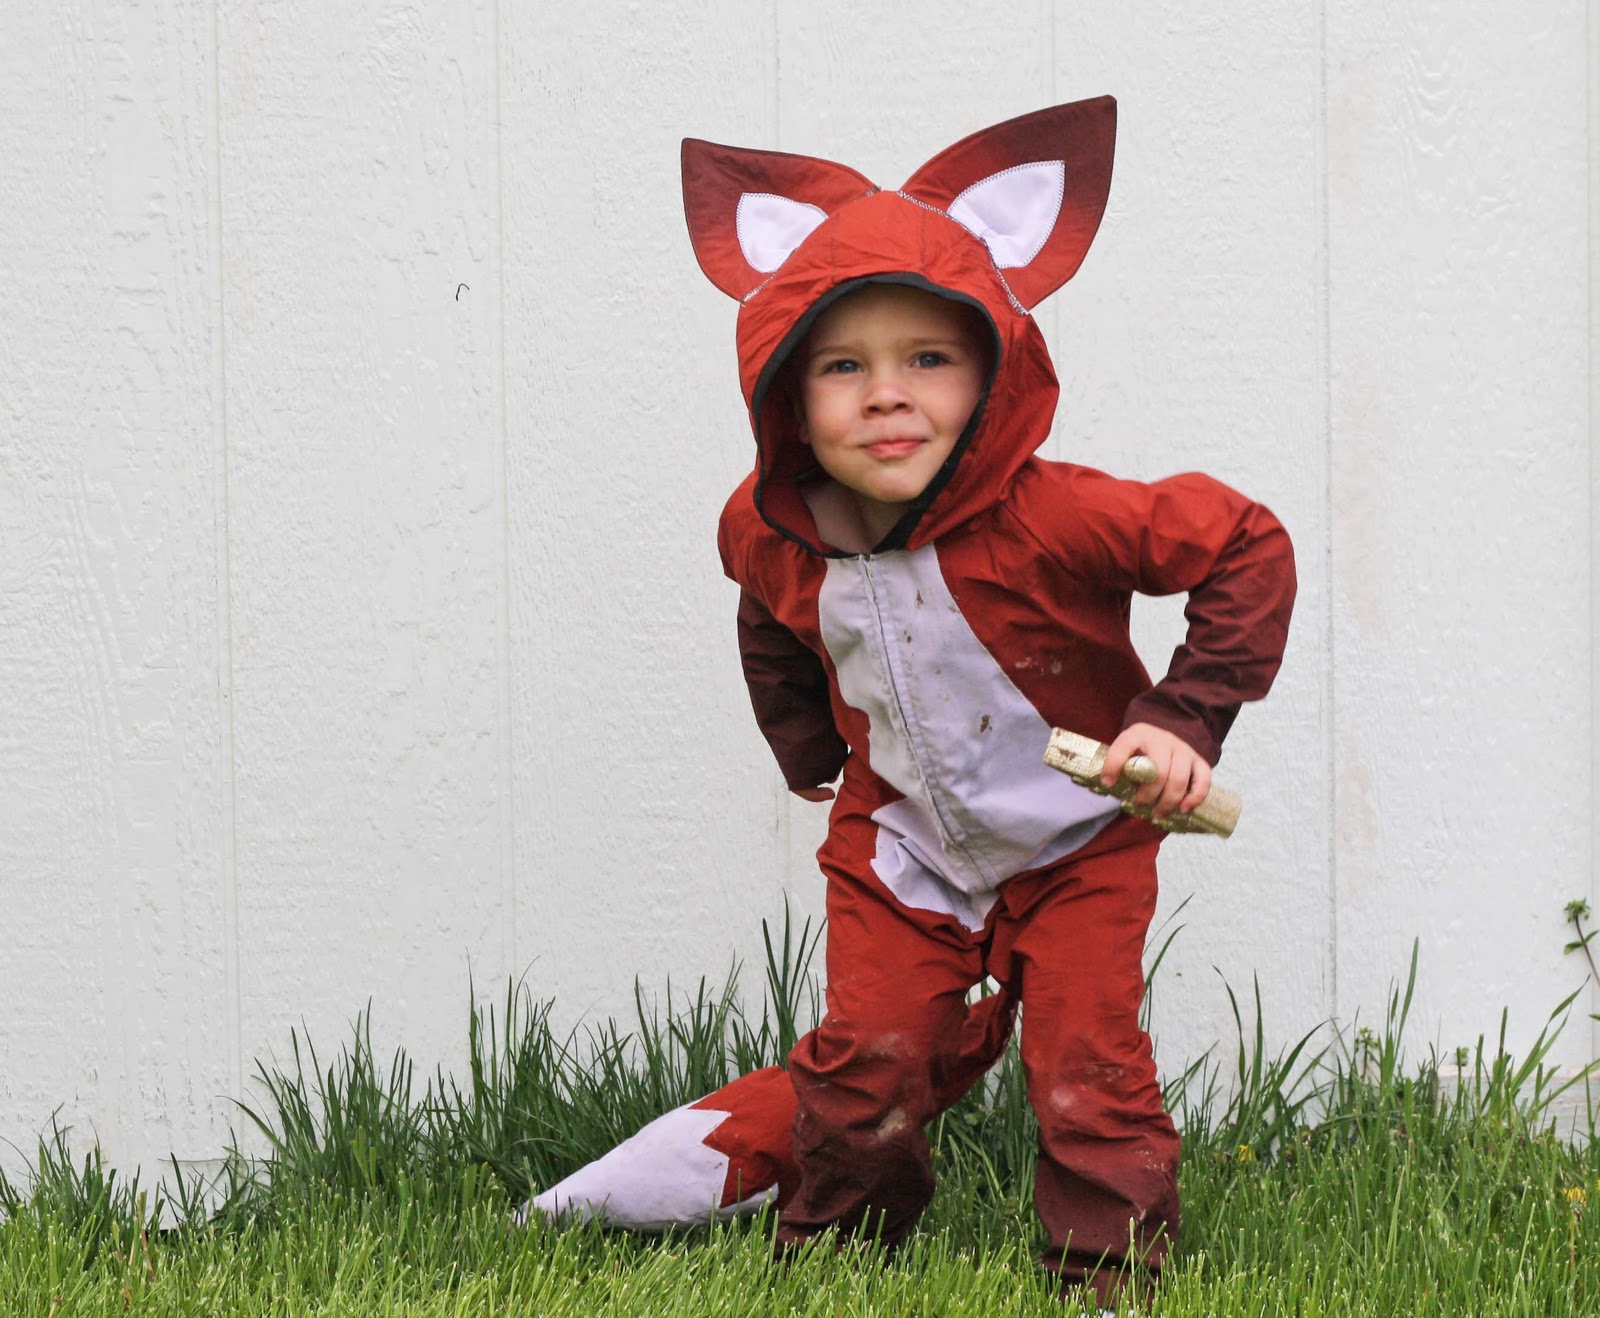 Running with scissors woodland animal costume sewing pattern solutioingenieria Gallery